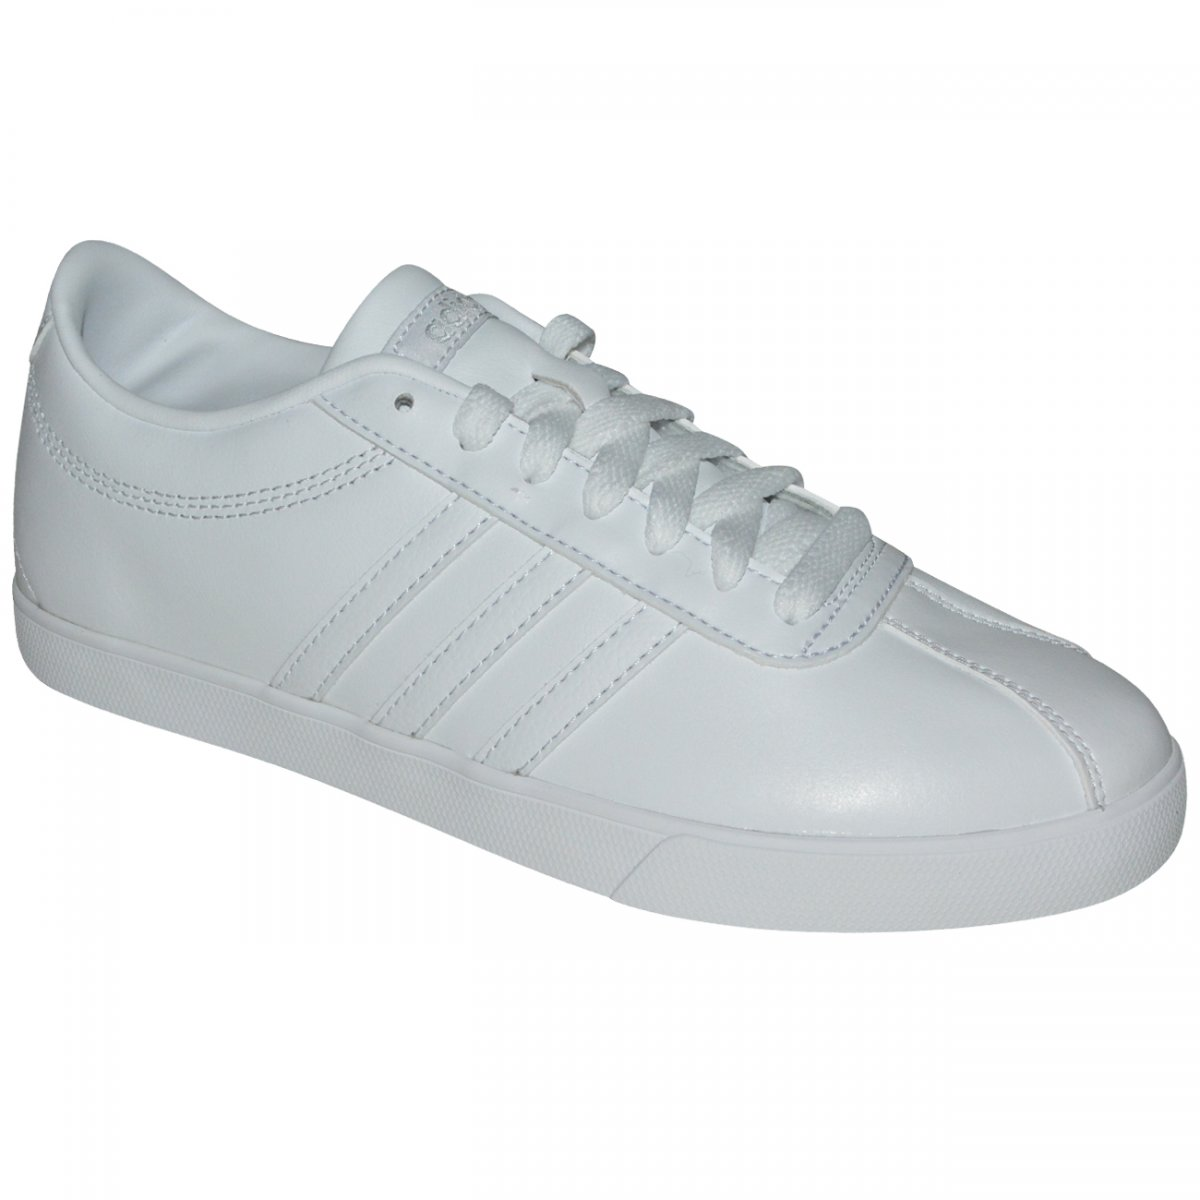 7ce42b27b6 Tenis Adidas Courtset W BB9659 - Branco Branco - Chuteira Nike ...